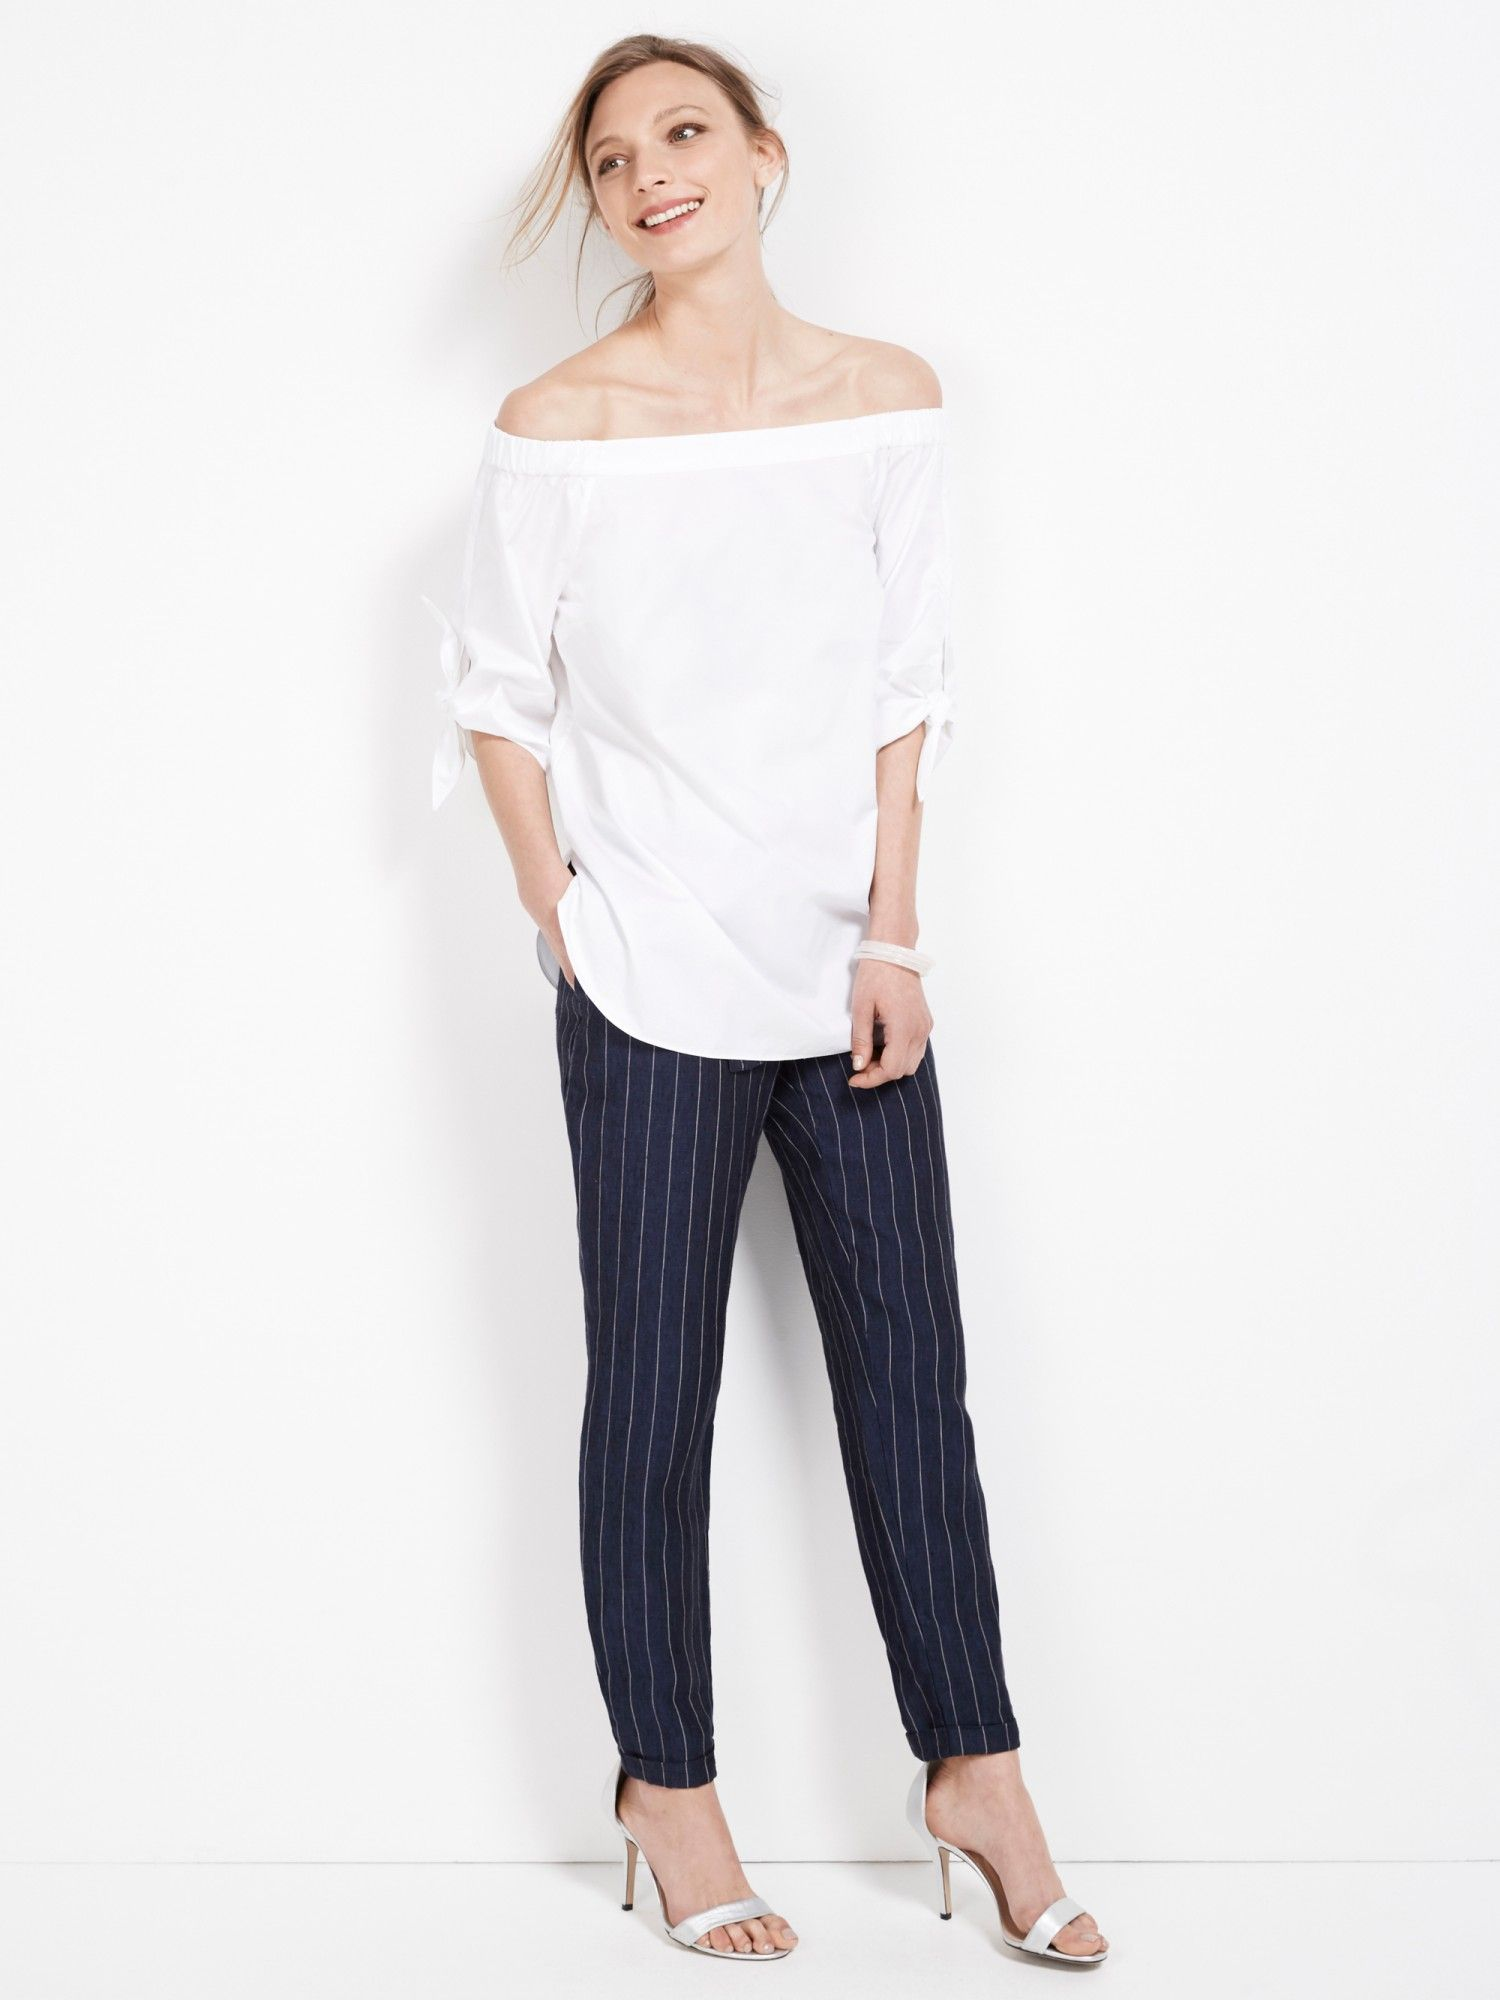 White shirt LookBook - September 2015 Sussan